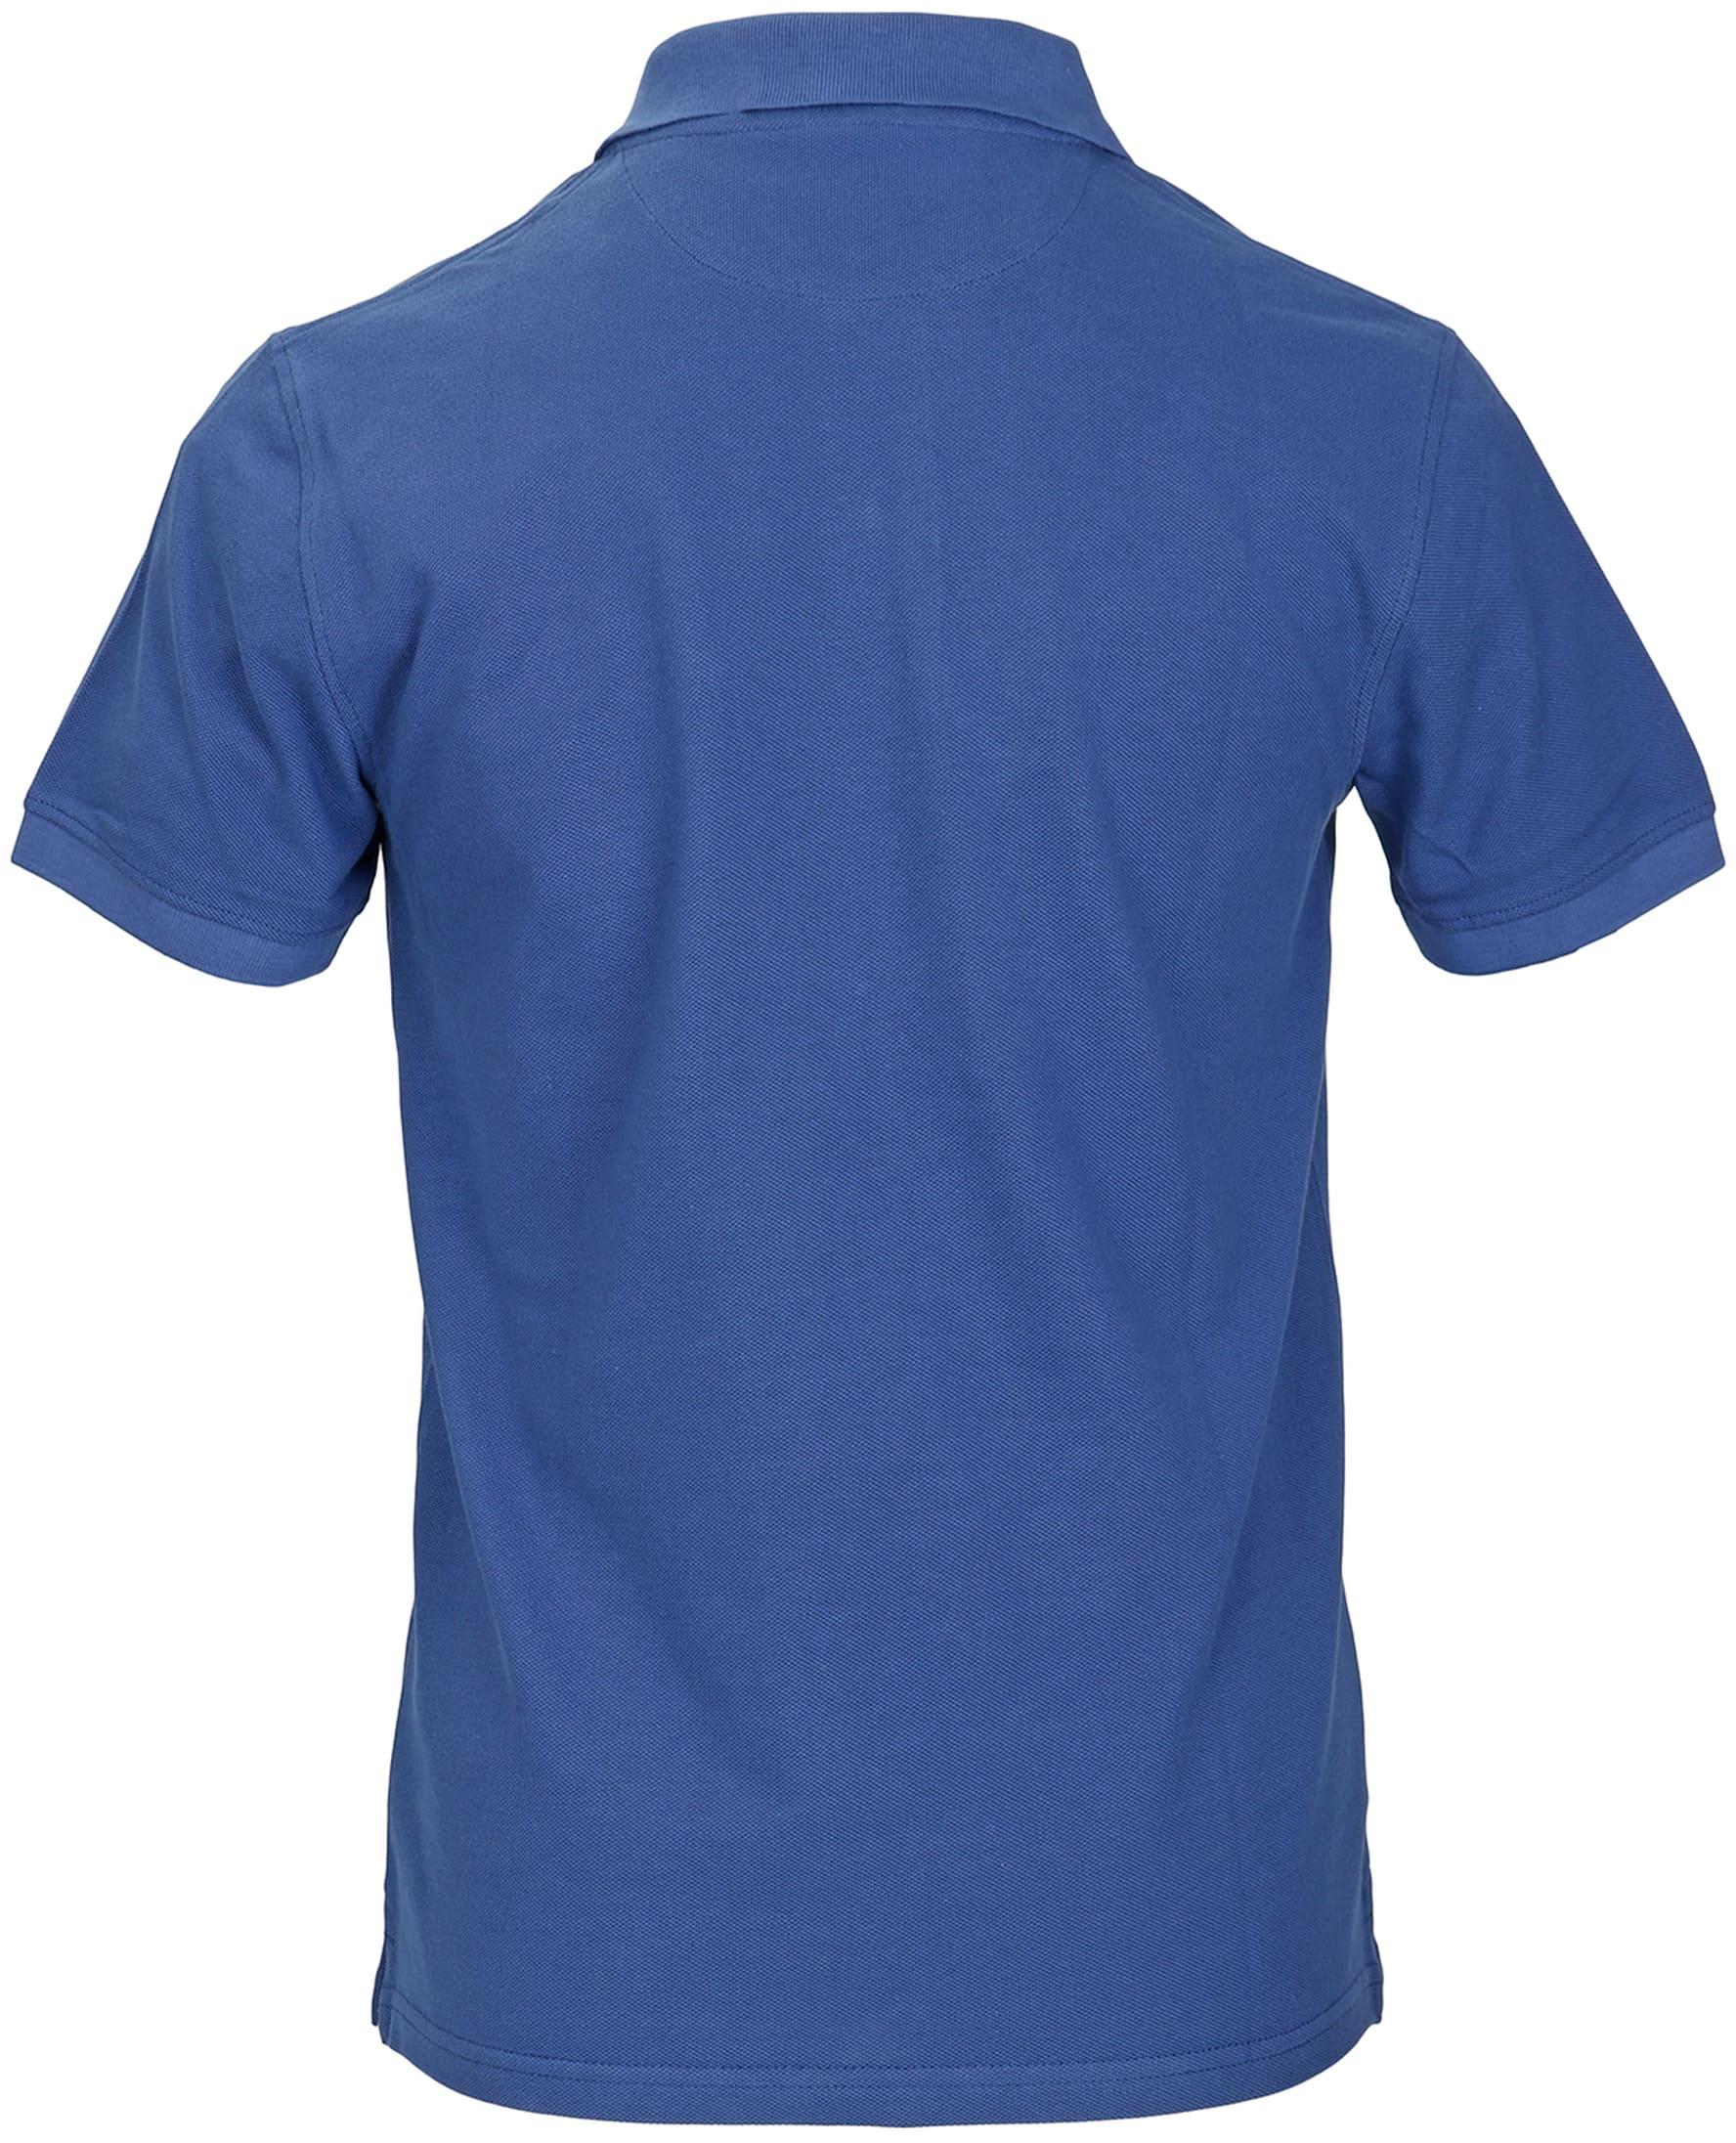 Timberland Polo Uni Blau foto 1